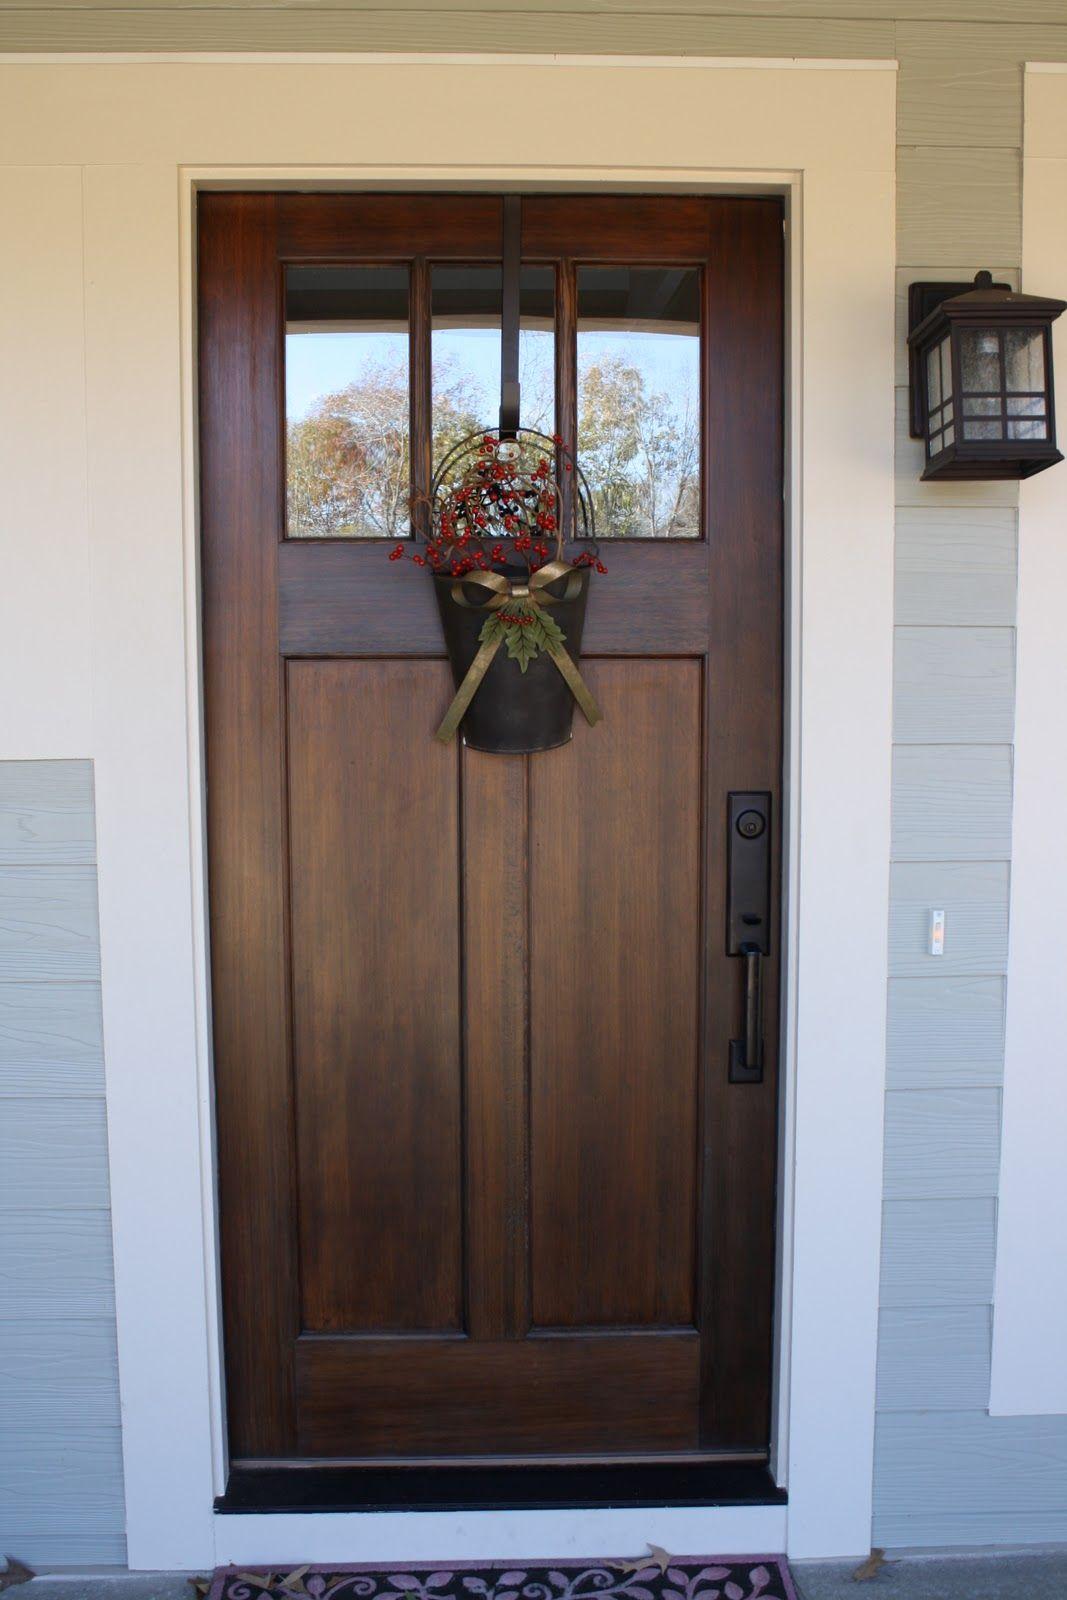 Pin By Kelly Klinger On Reno Doors Exterior Doors Entry Doors